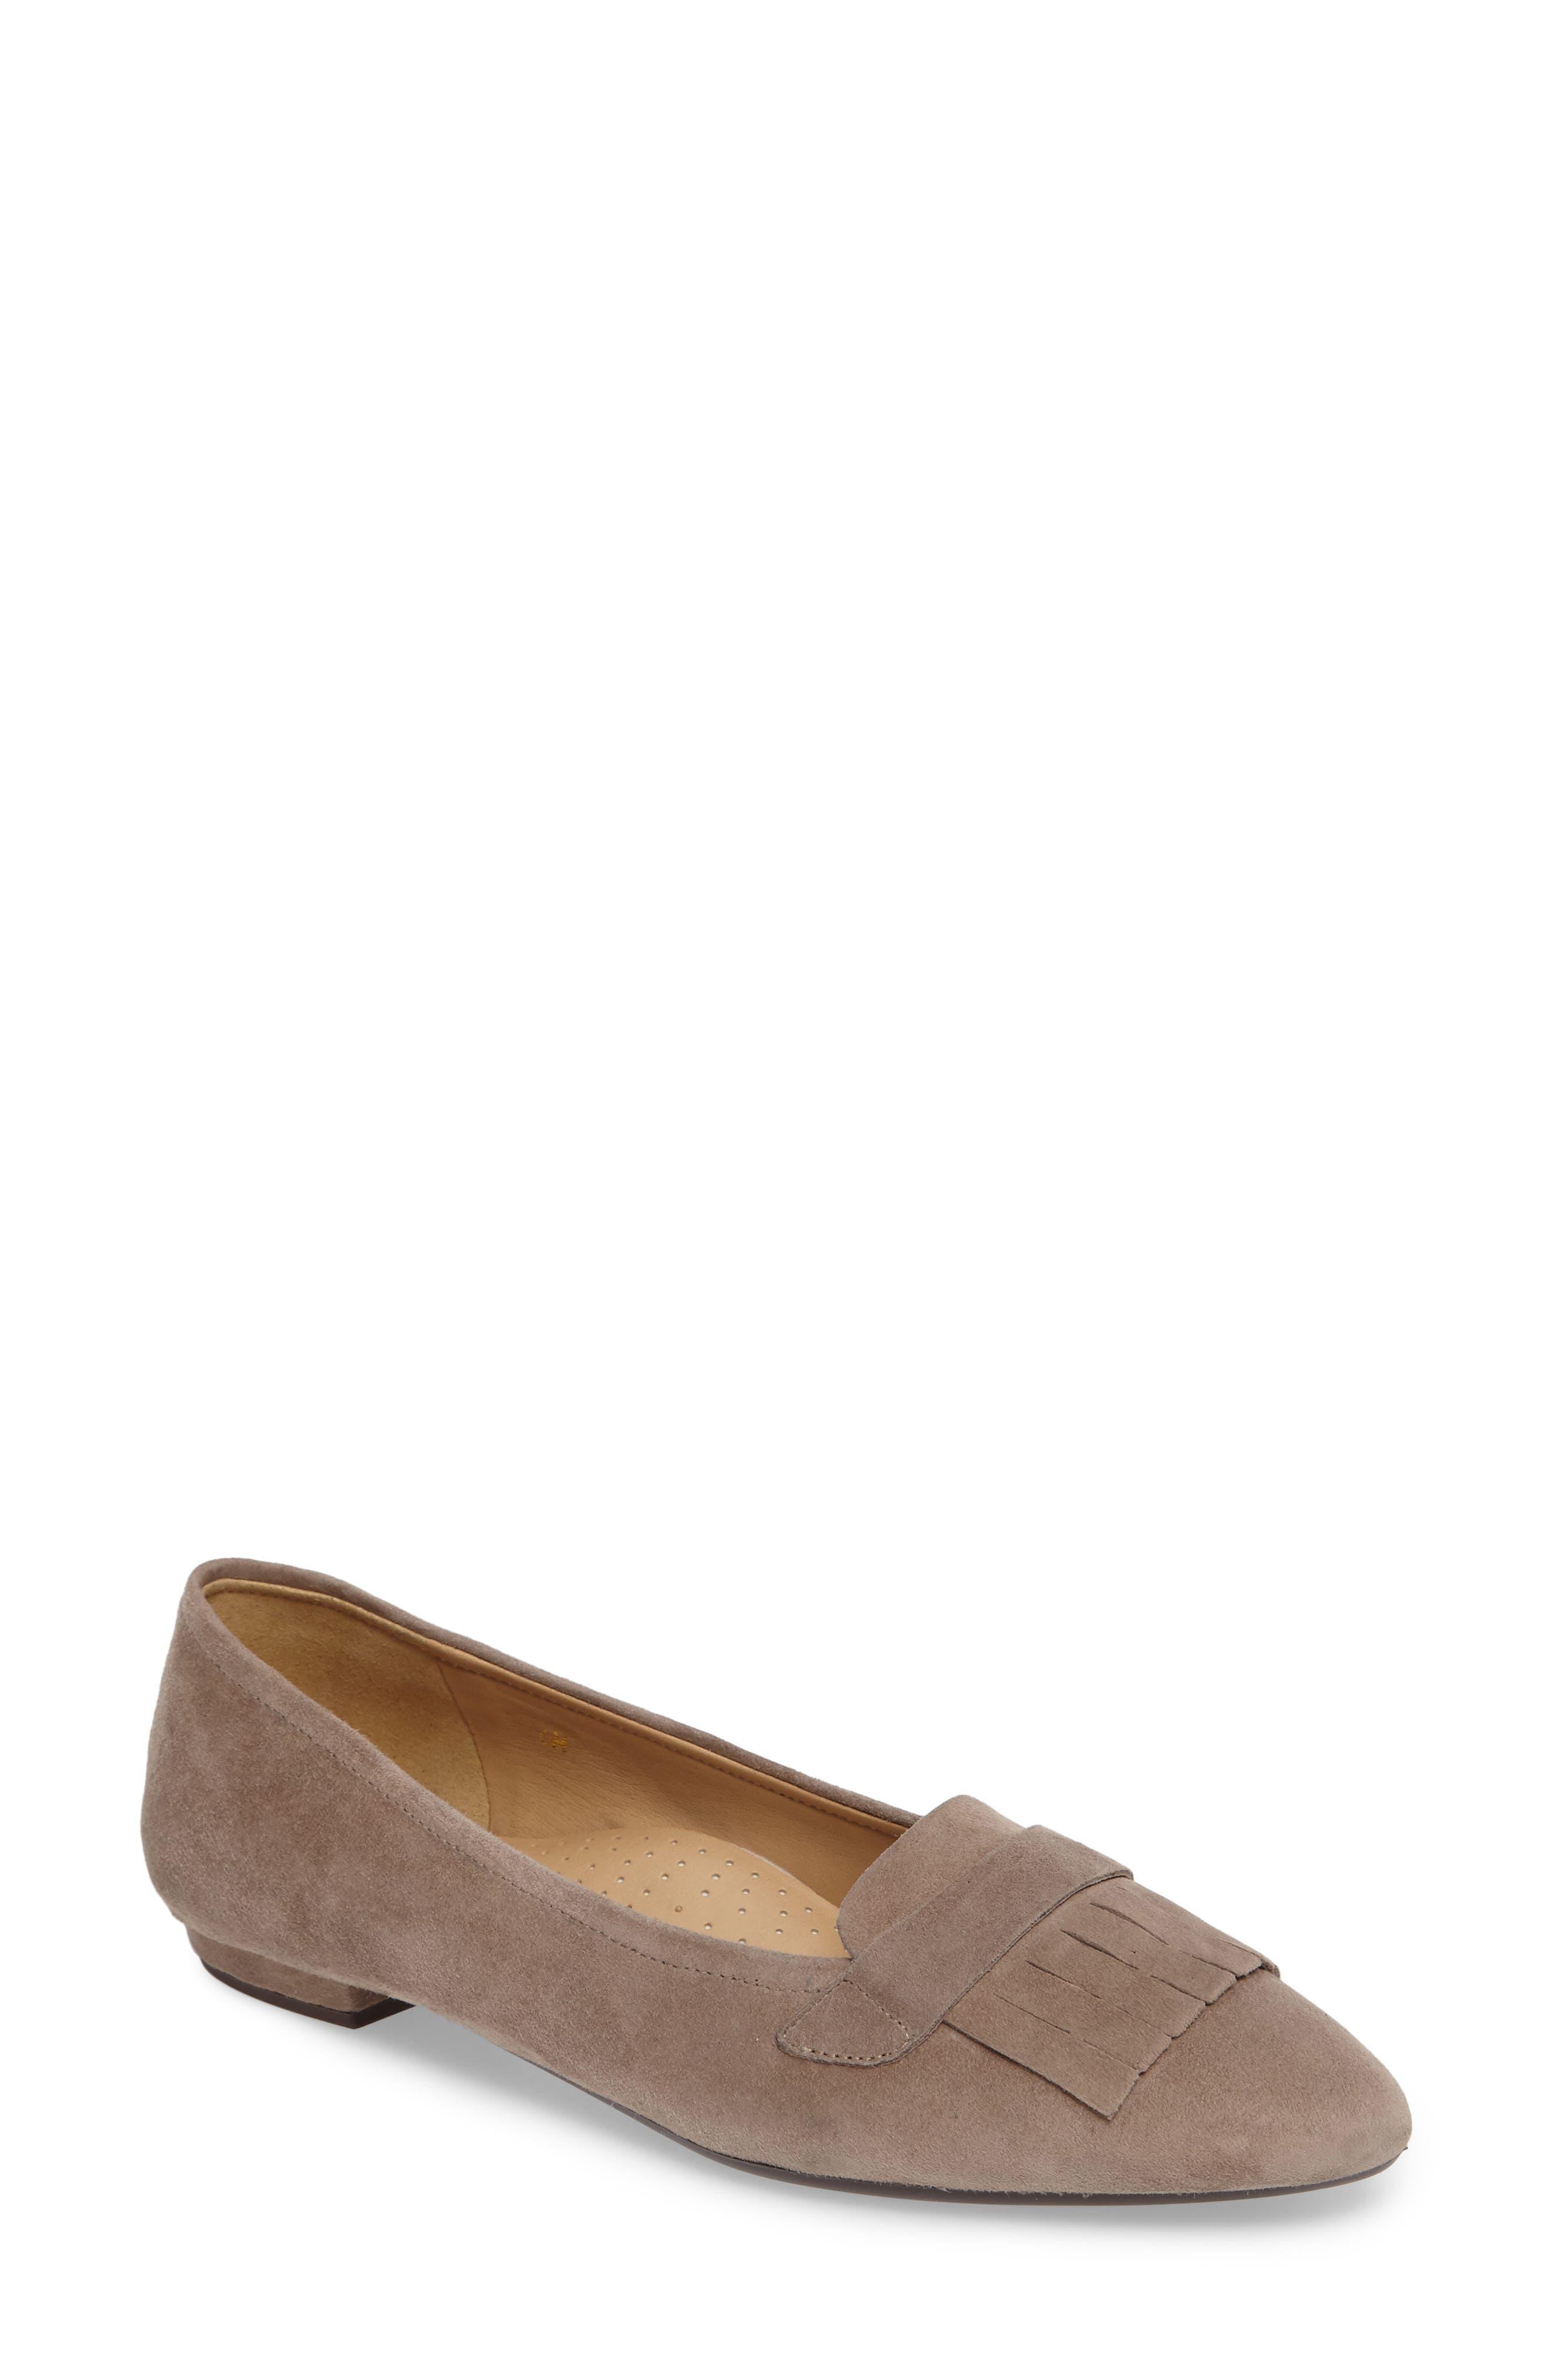 Alternate Image 1 Selected - VANELi Gaea Loafer Flat (Women)